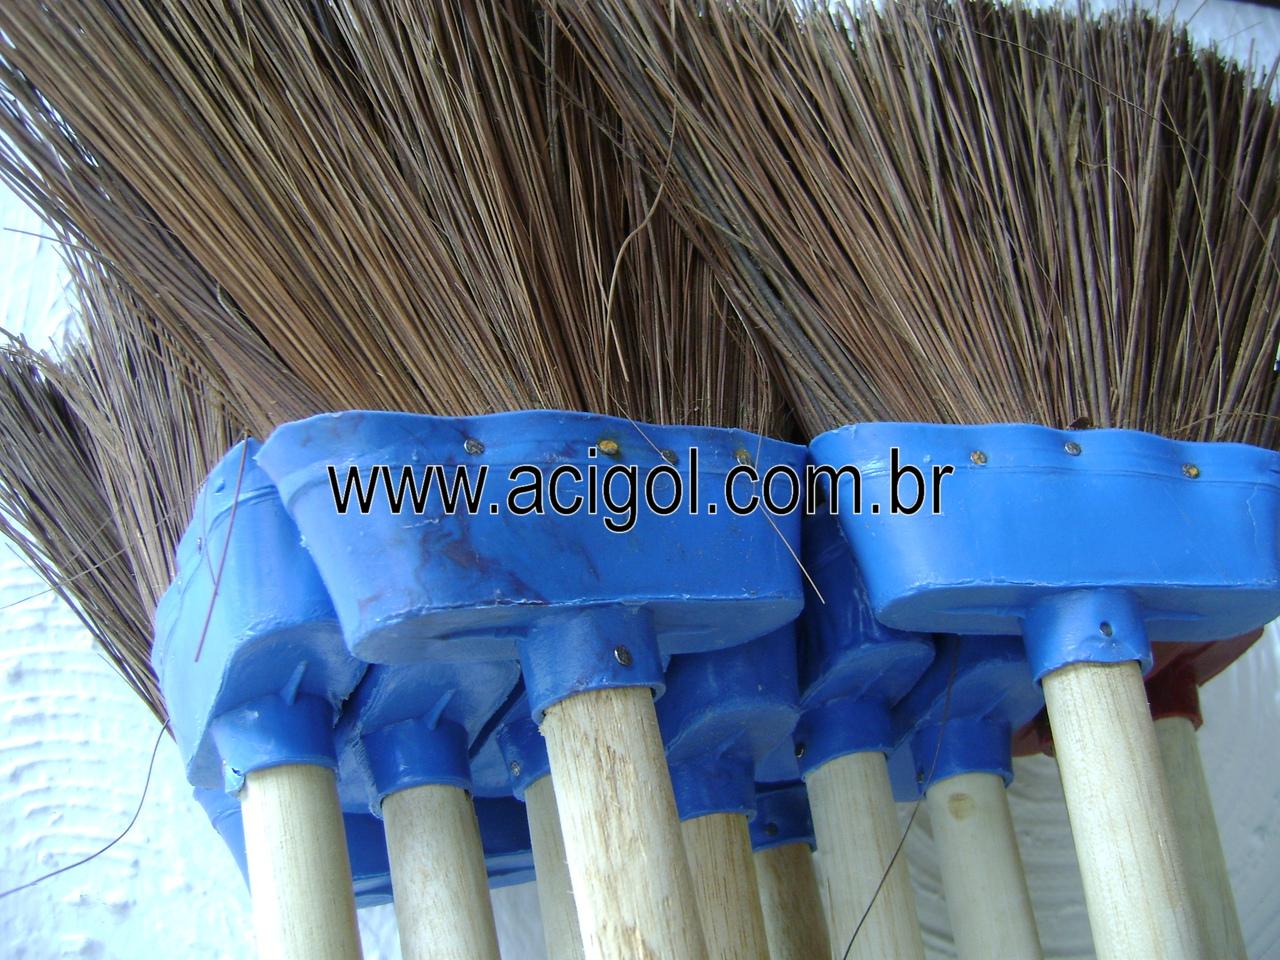 VASSOUA DE PIASSAVA GRANDE-FOTO ACIGOL 81 34451782-DSC09956